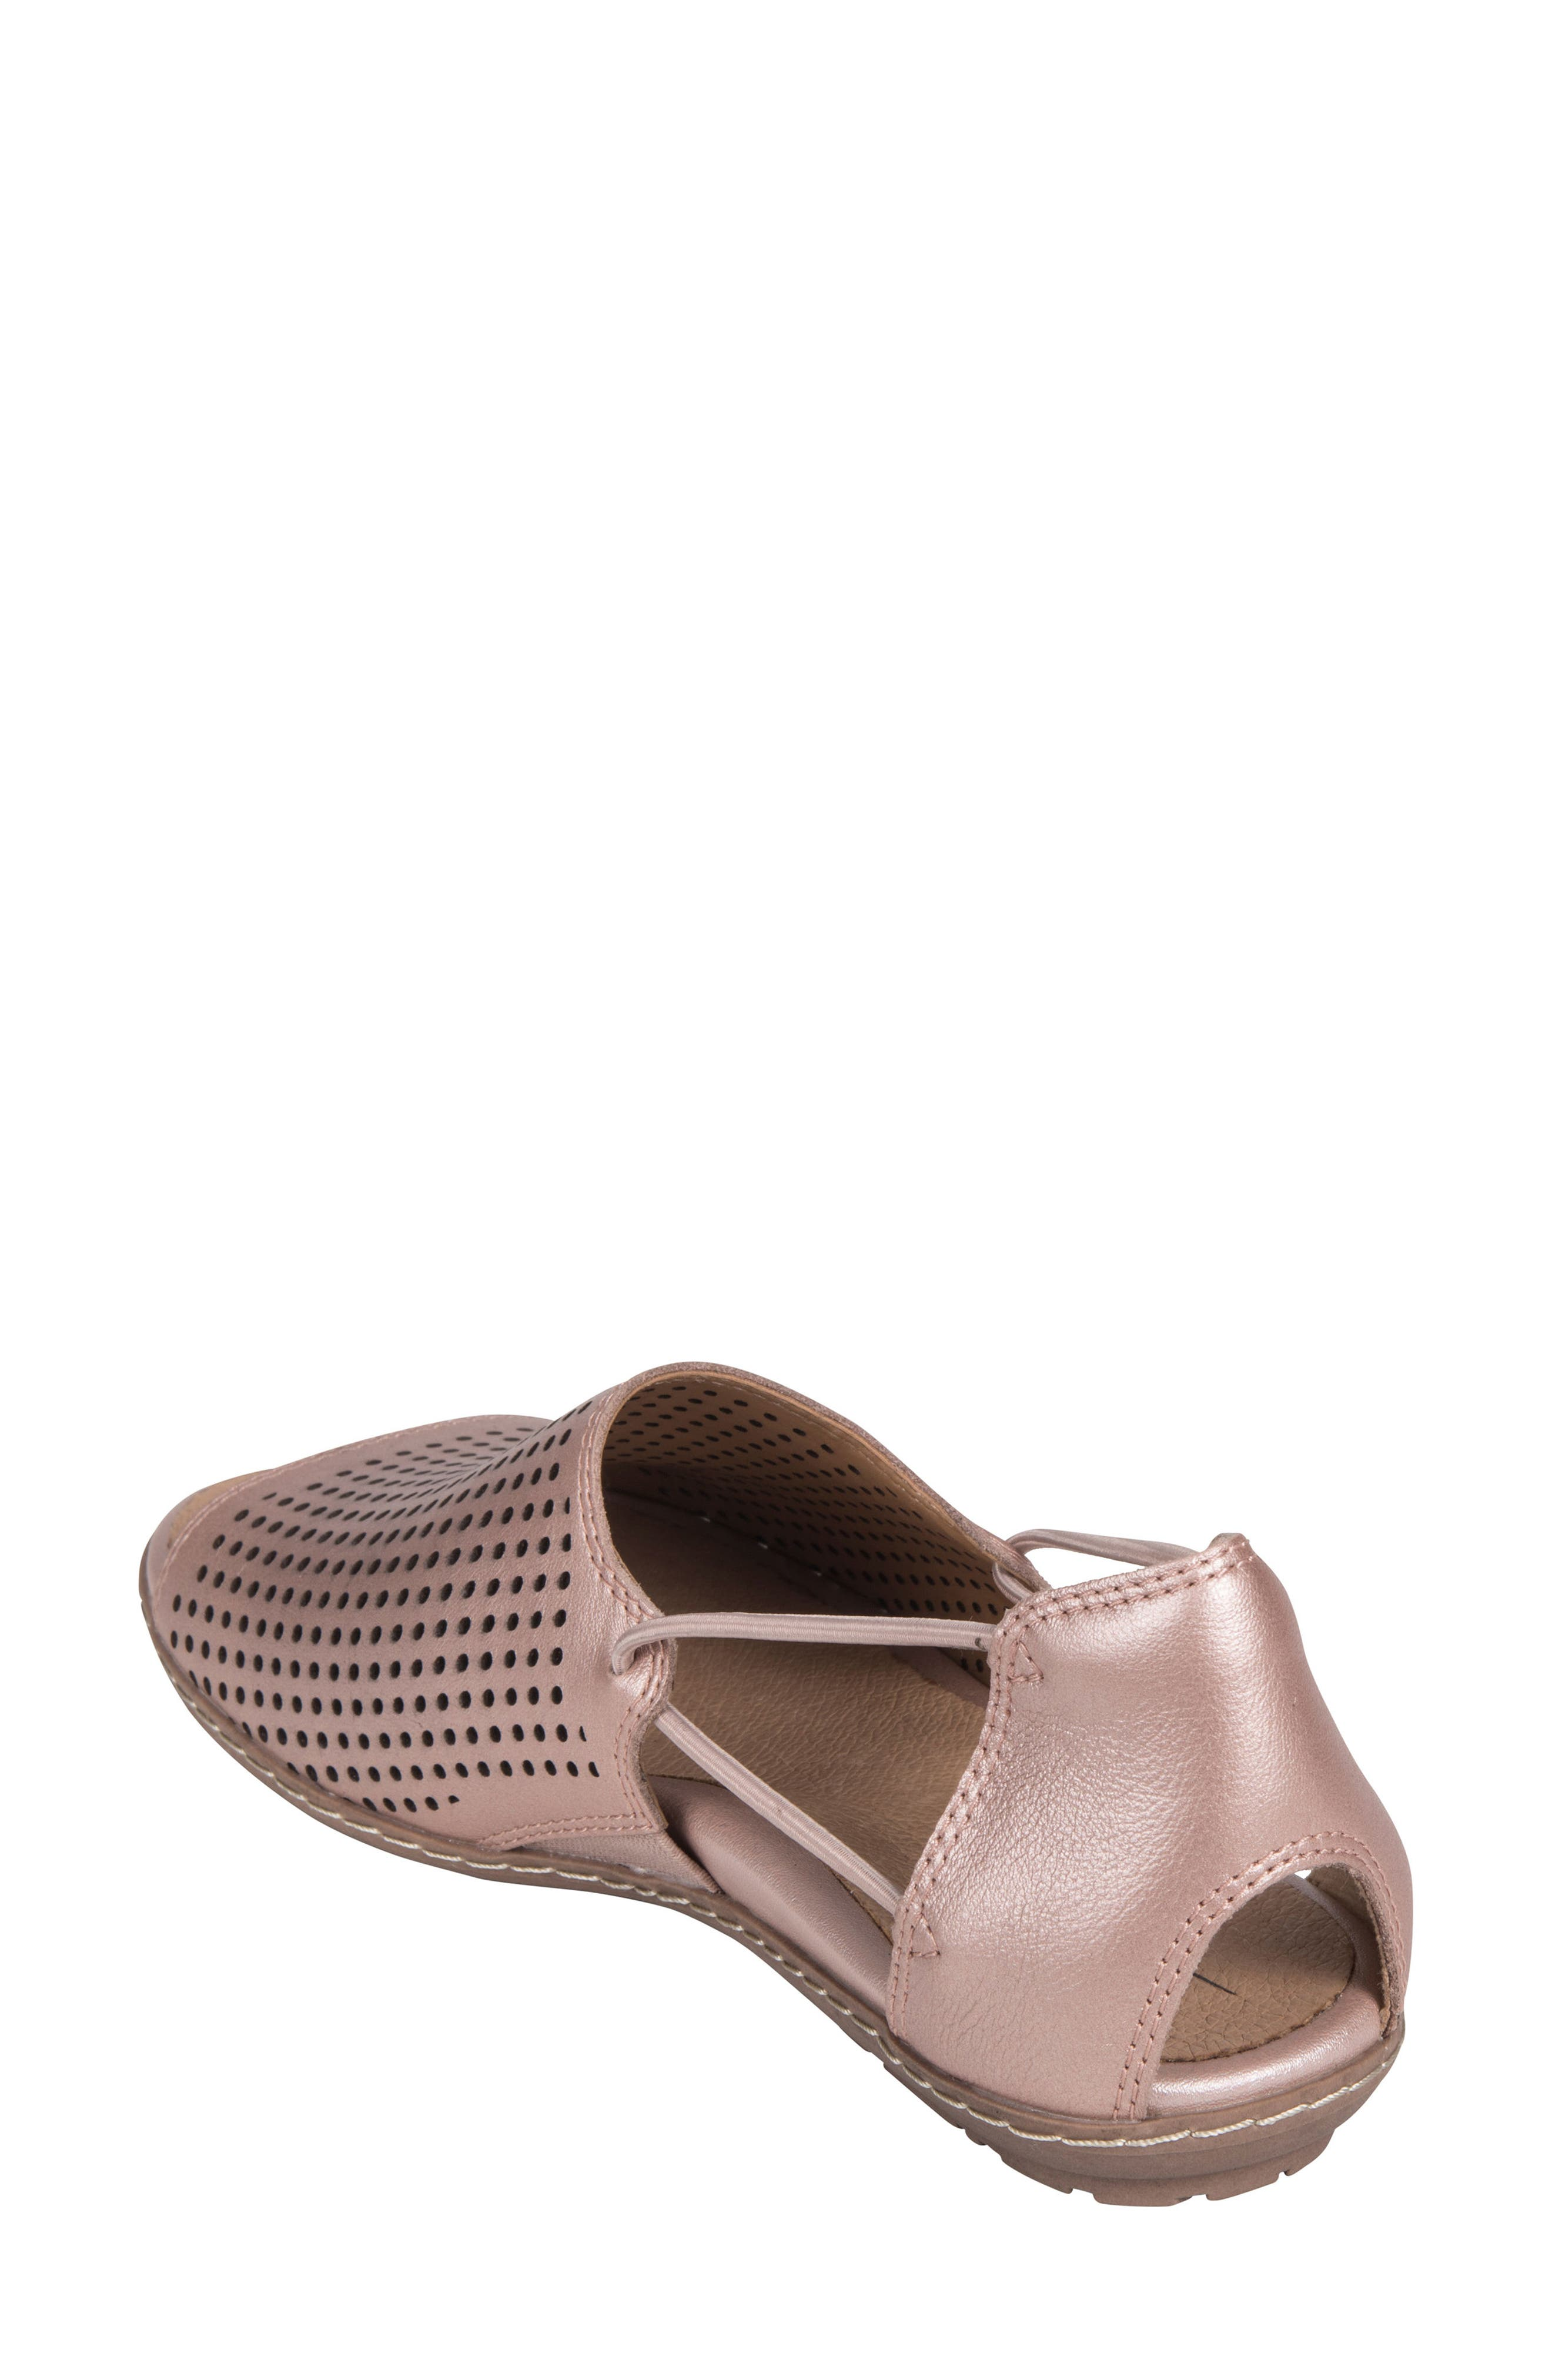 Shelly Sandal,                             Alternate thumbnail 2, color,                             Blush Metallic Leather